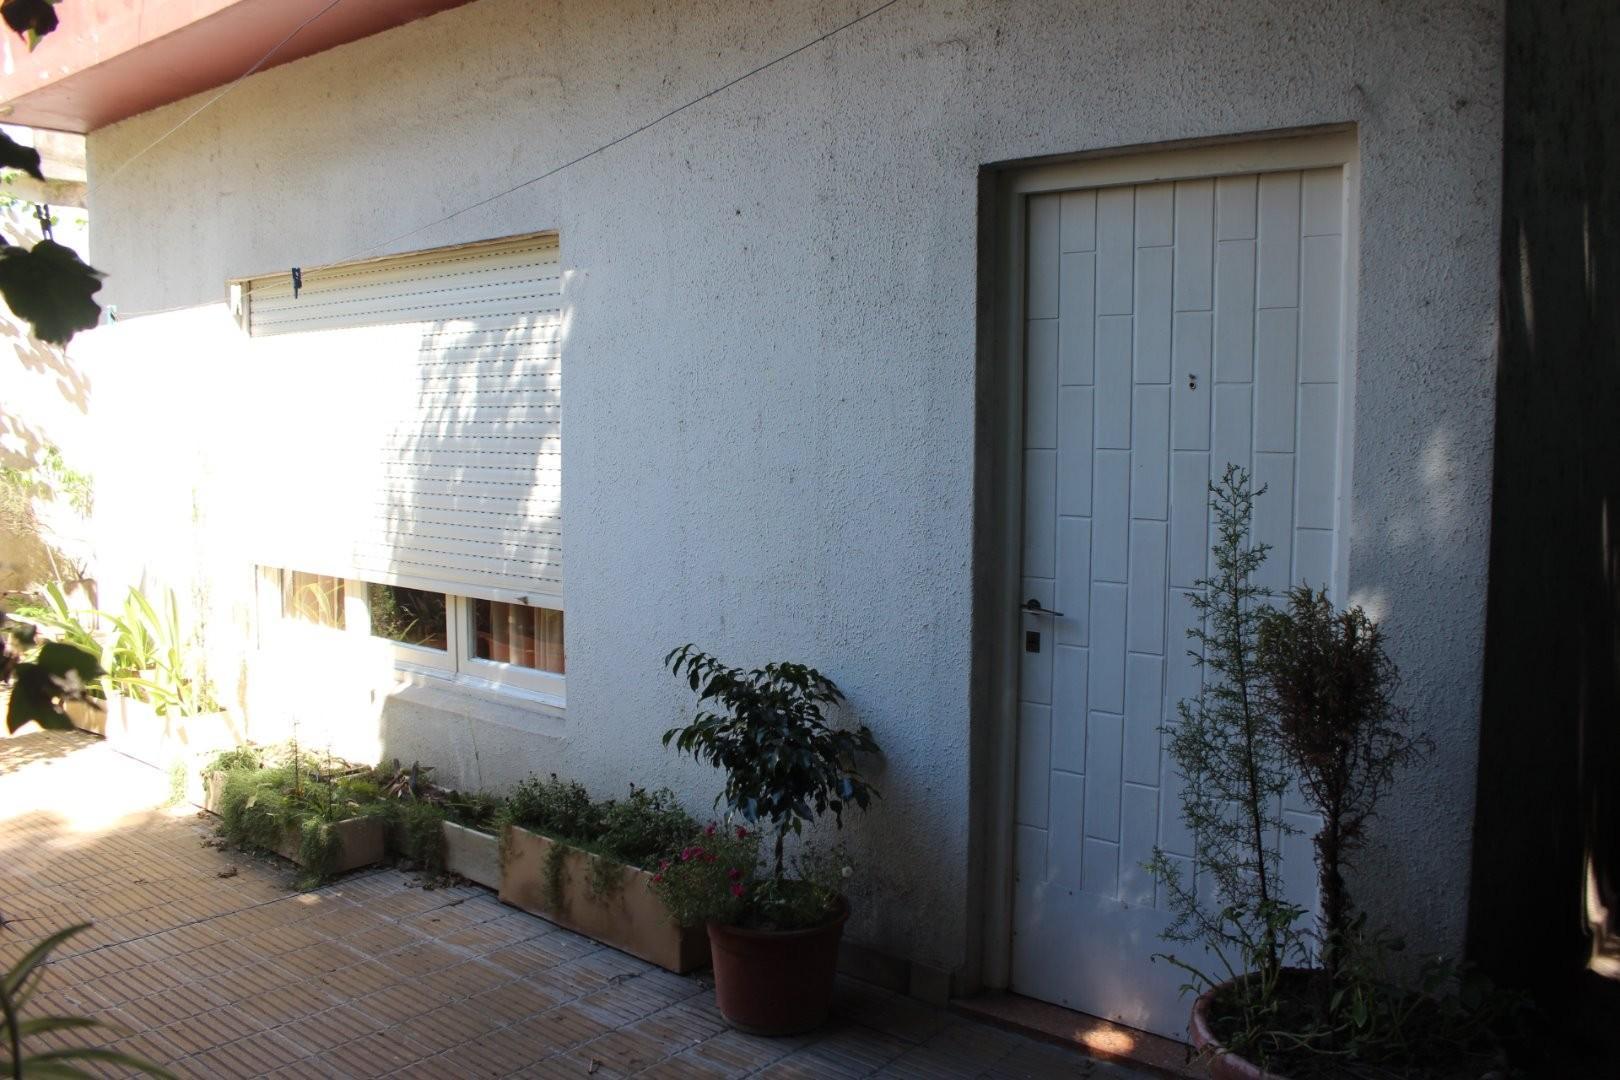 Casa a mts de Av Vergara 3700 - 10 Cuadras Estacion de Hurlingham